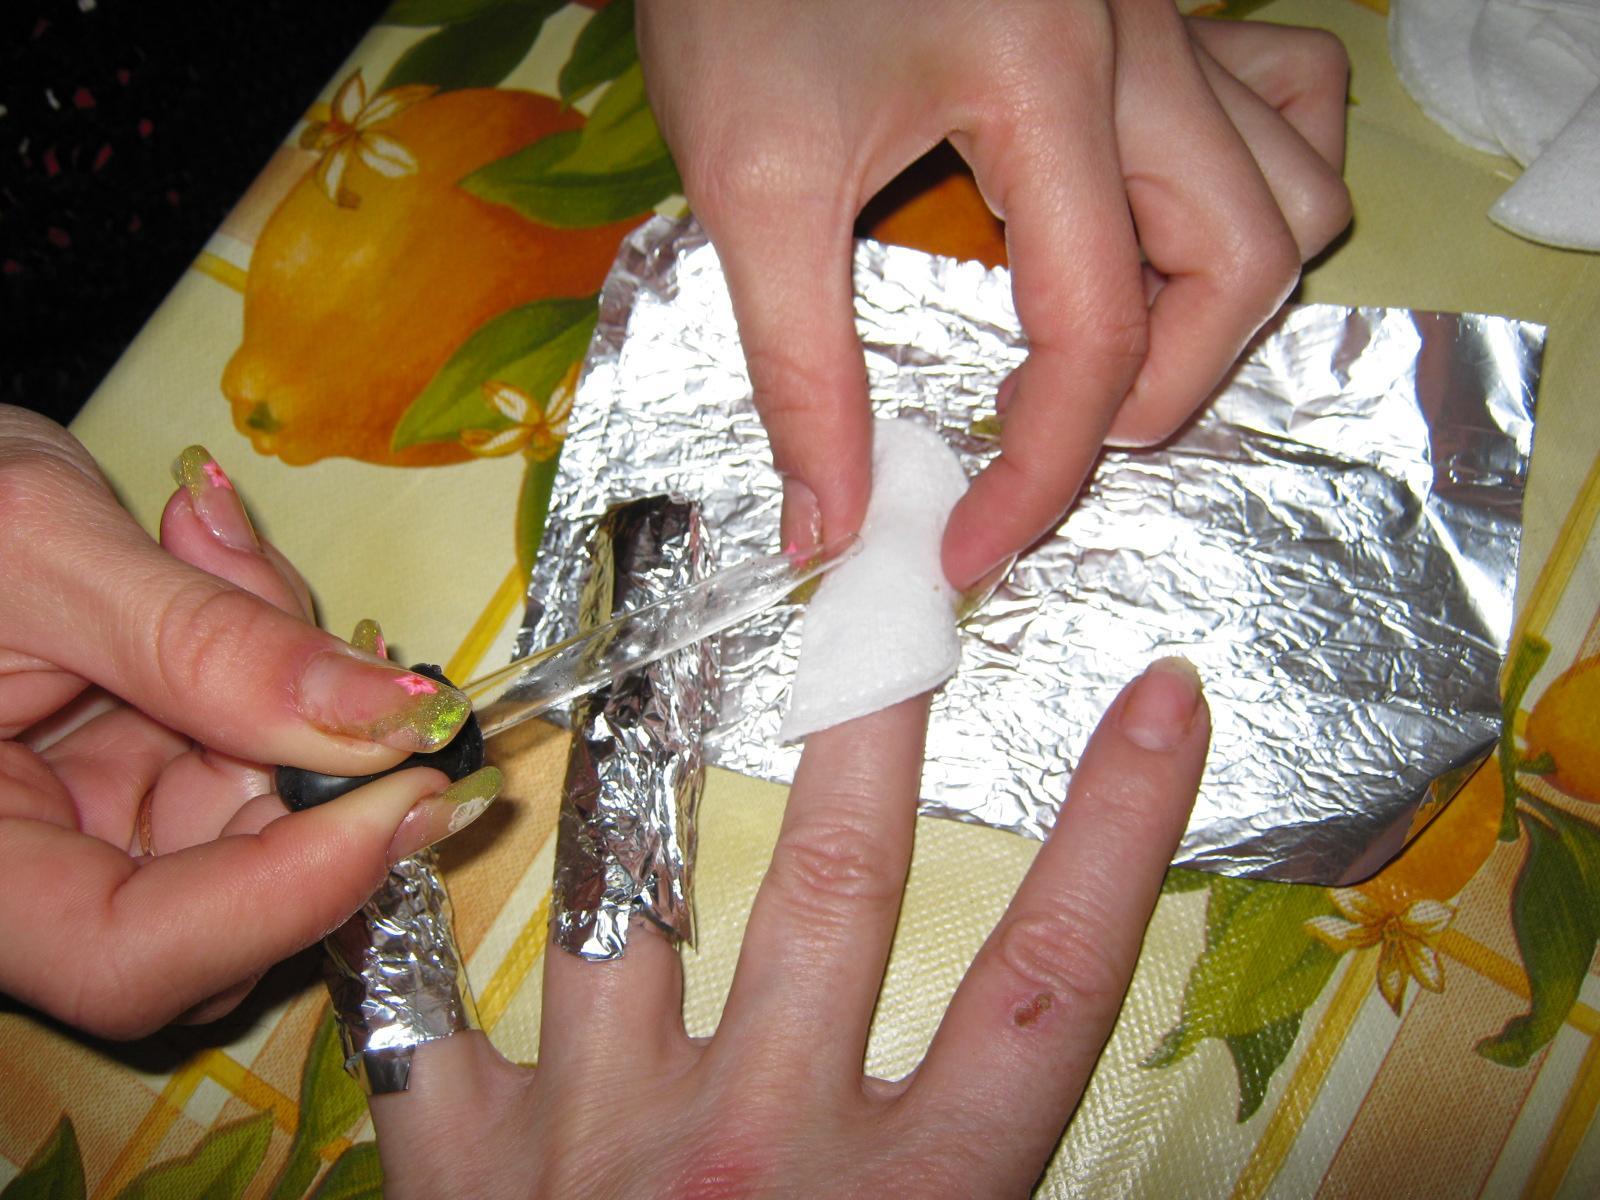 Фото нарощенных ногтей в домашних условиях